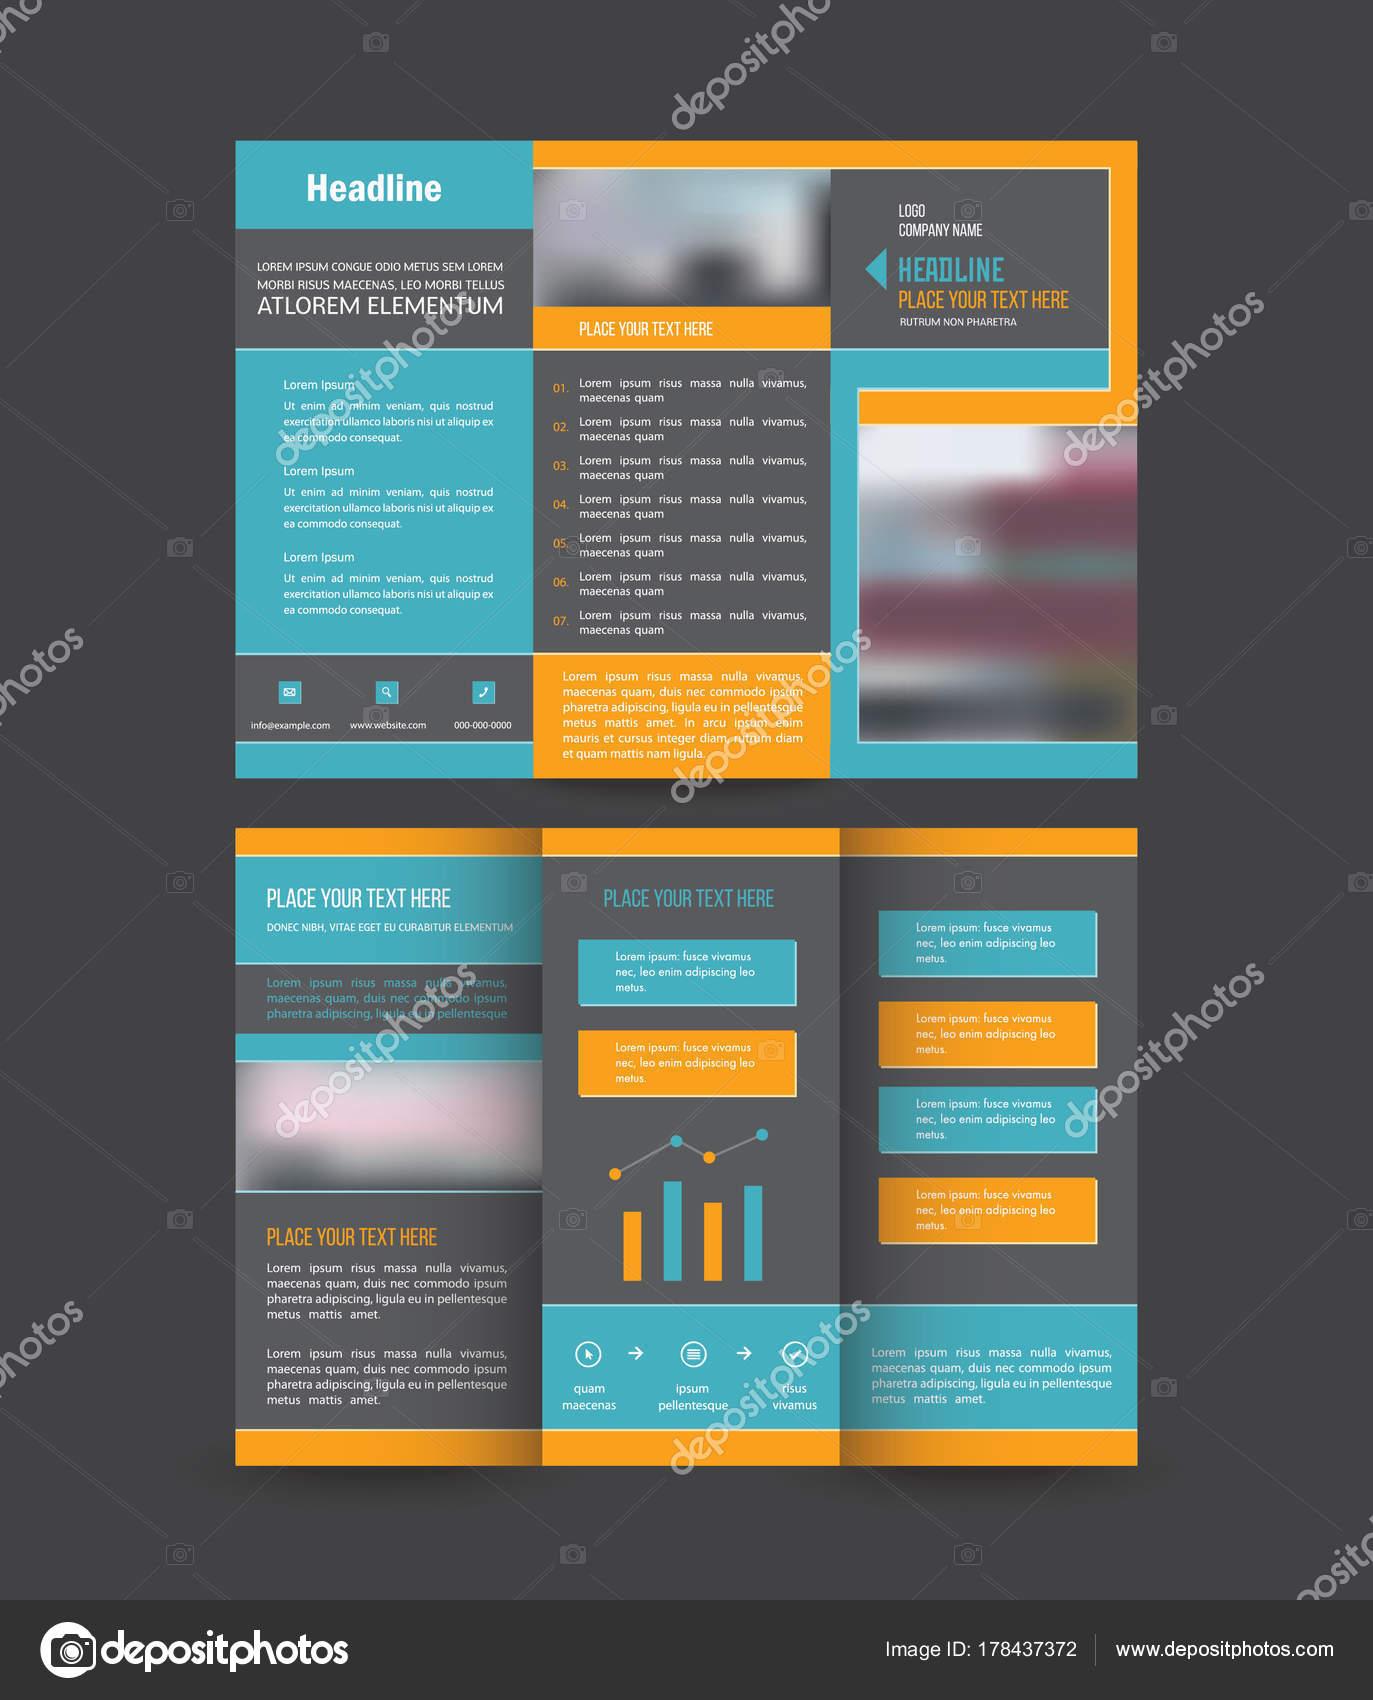 Plantillas Diseño Folleto Para Tríptico Flyer Folleto Sobre Fondo ...